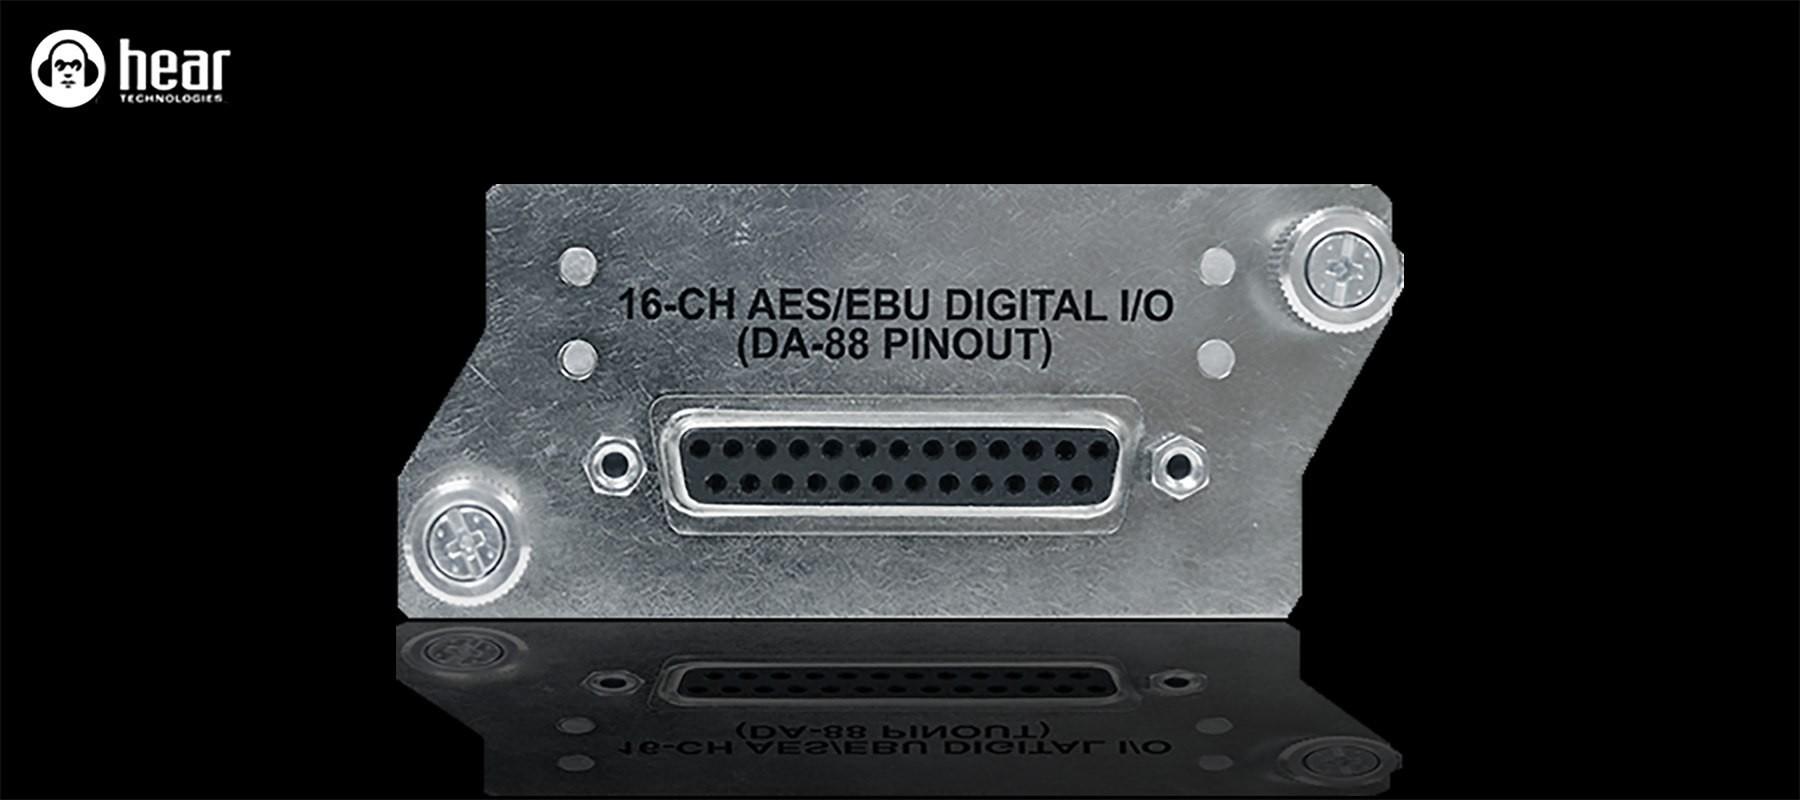 Hear Technlogies AES Card for PRO Hub